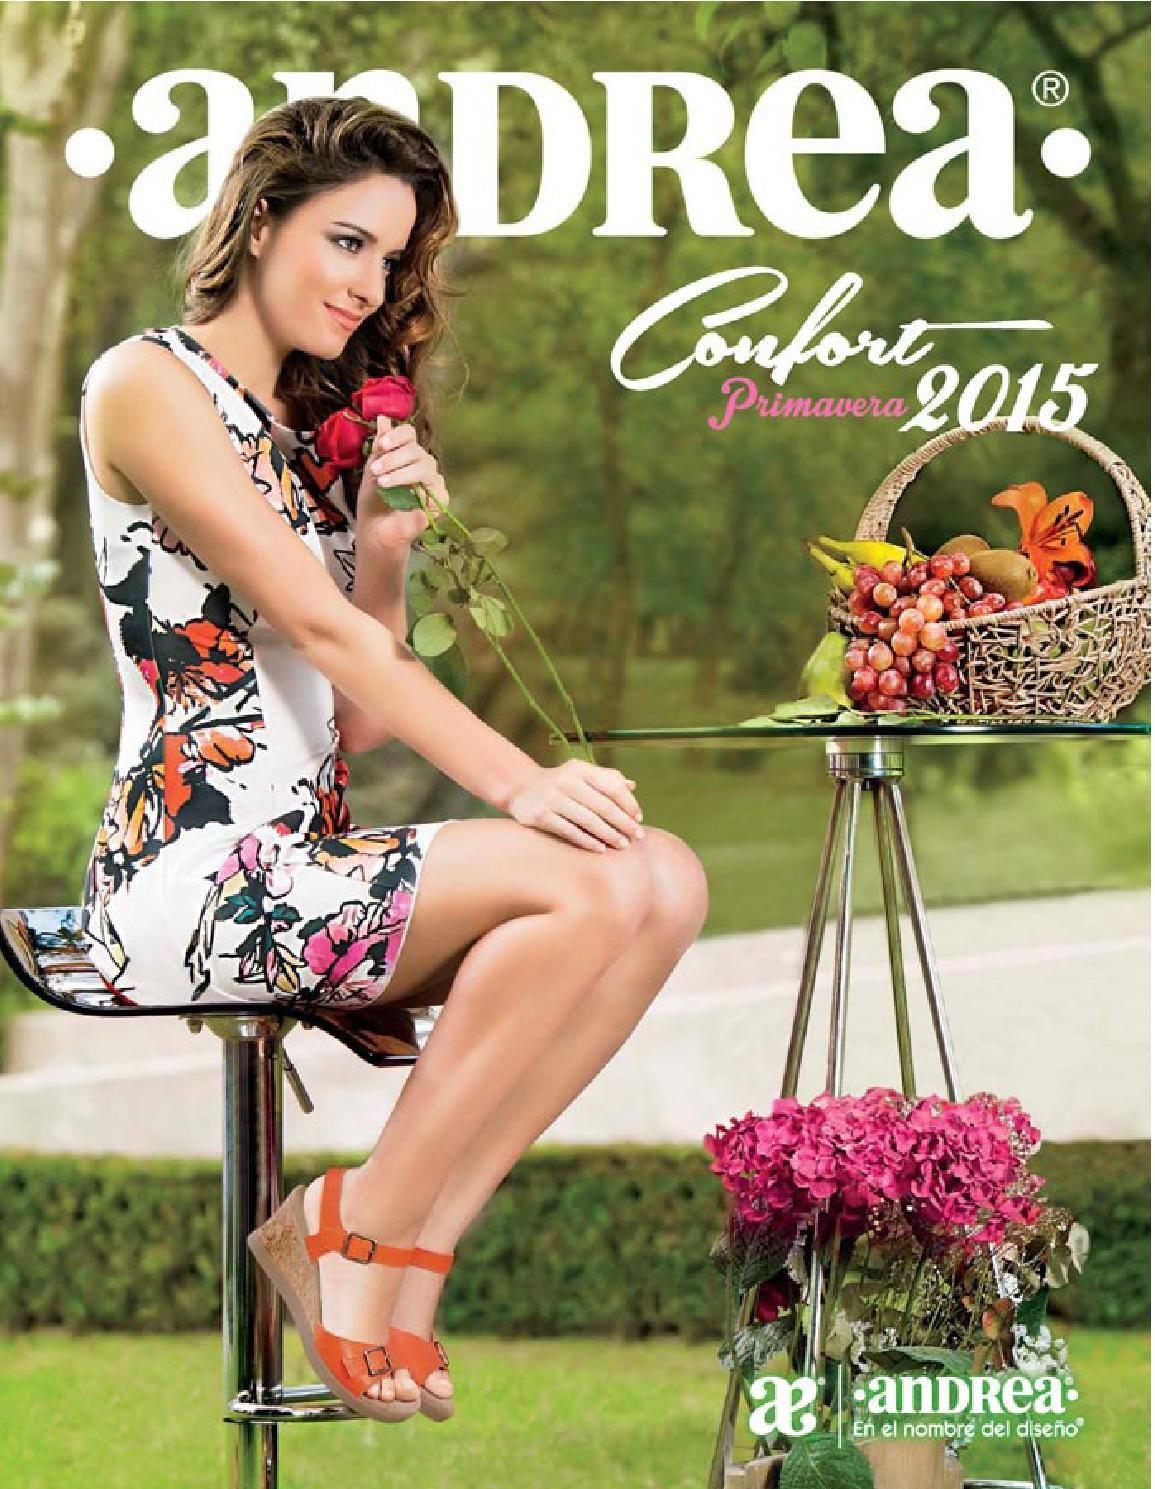 Confort Zapatos Andrea Fashion Fashion Catalogue Fashion Shoes